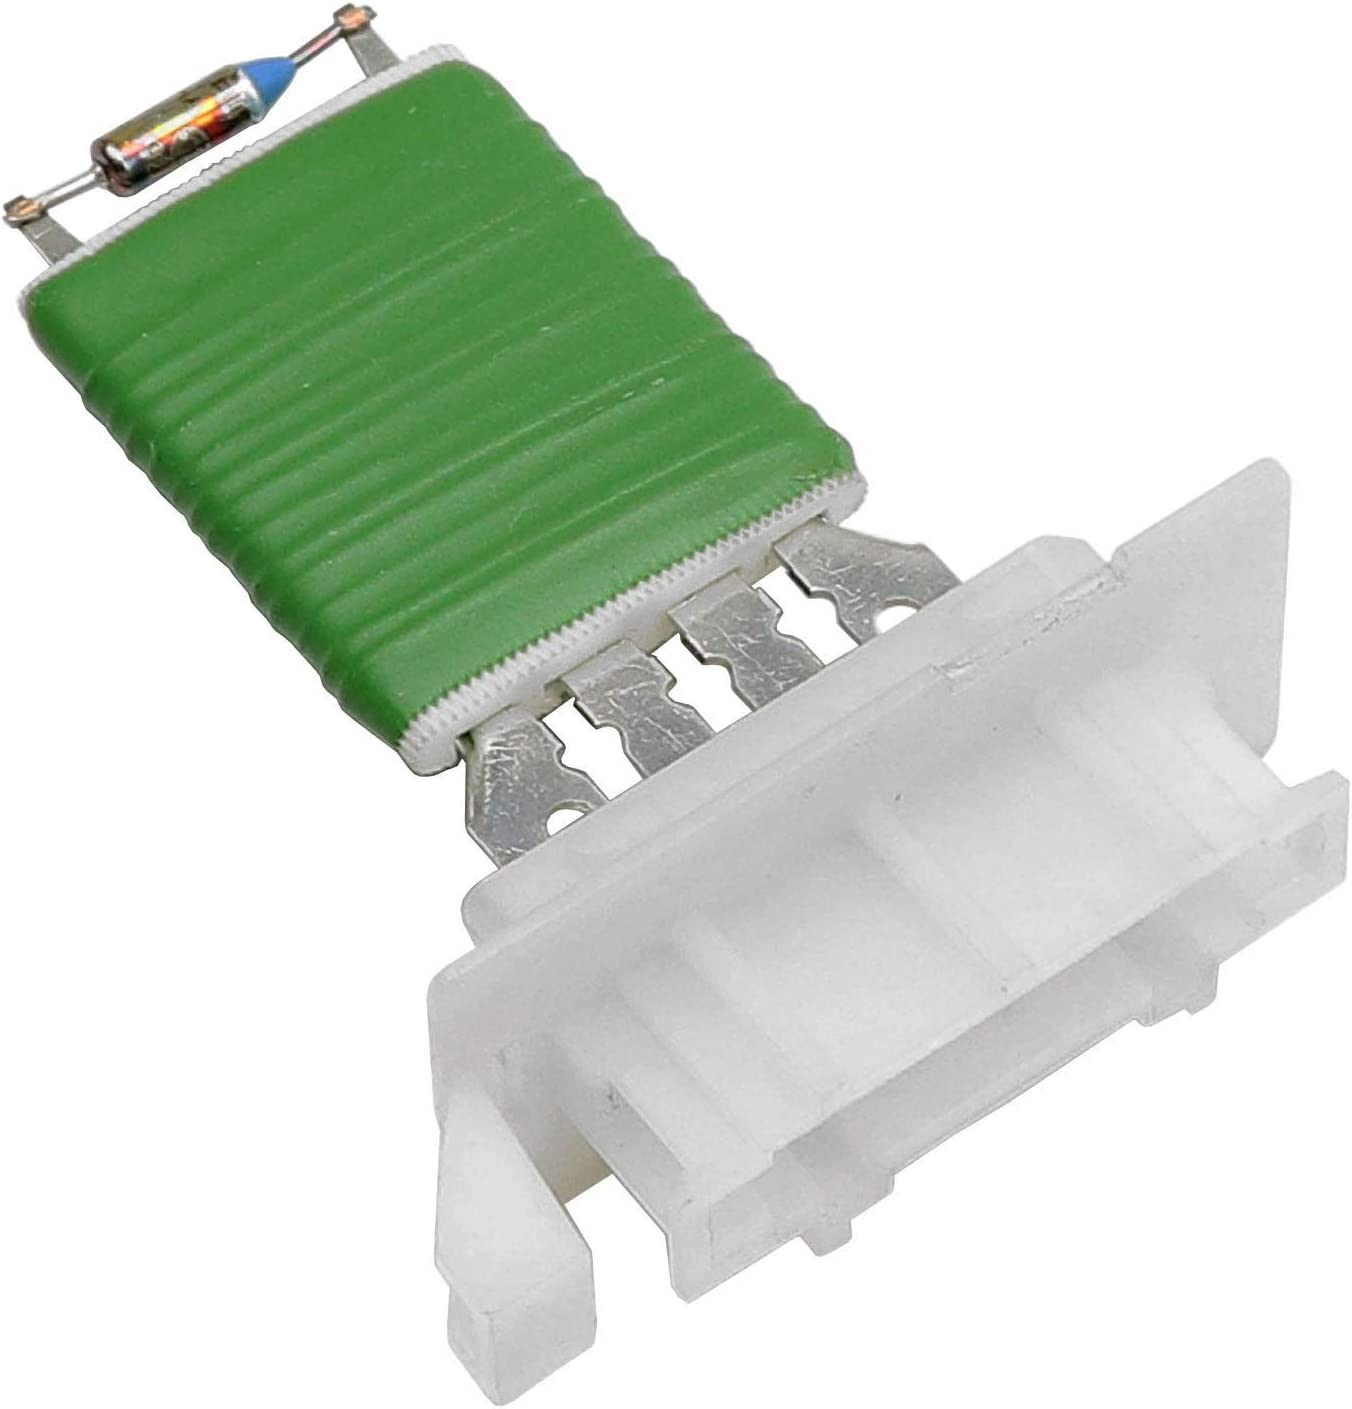 BECKARNLEY 204-0105 Blower Motor Resistor